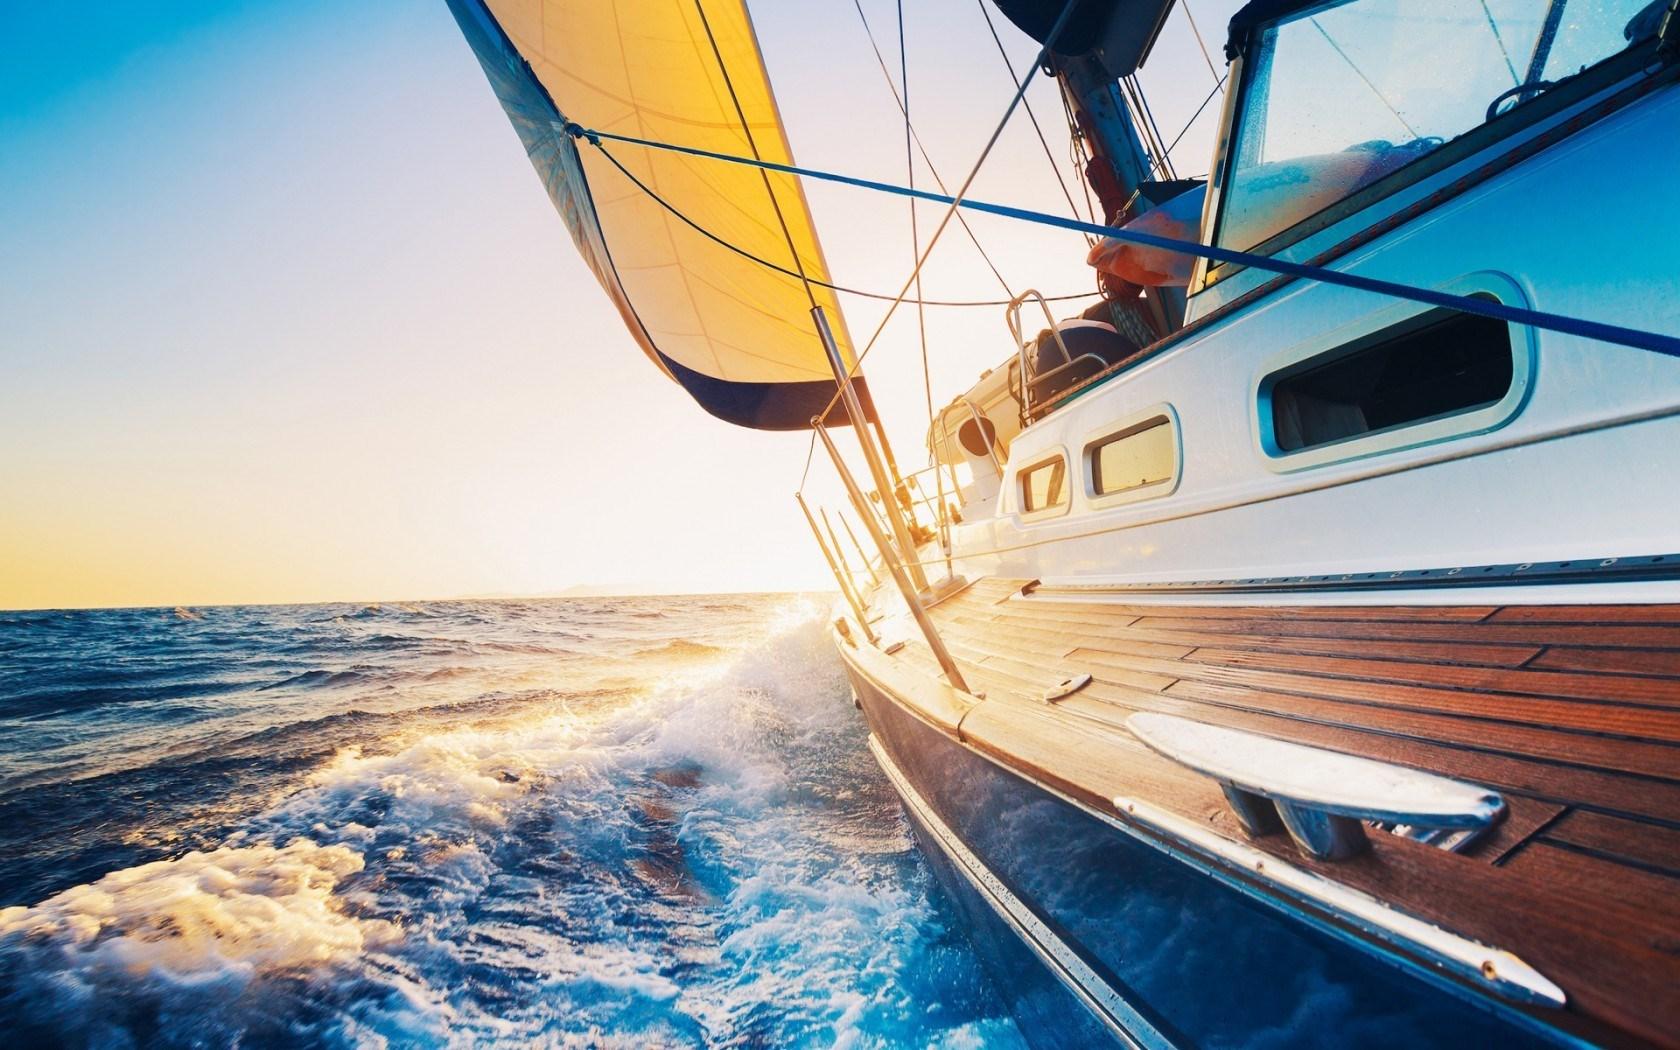 Free Yacht Wallpaper